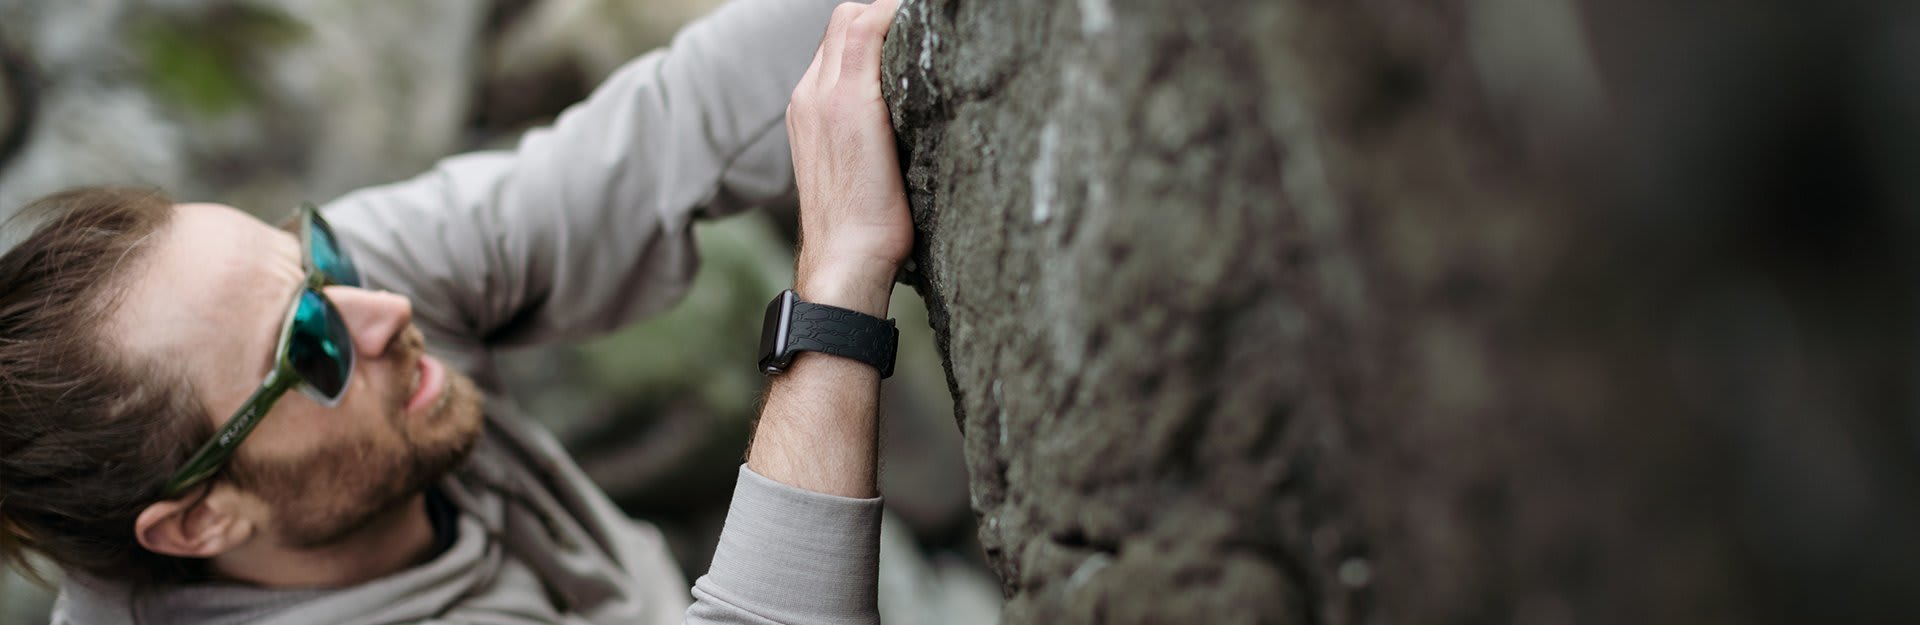 Men's Watch bands, a man wearing sunglasses and a black watch band climbs a rock face